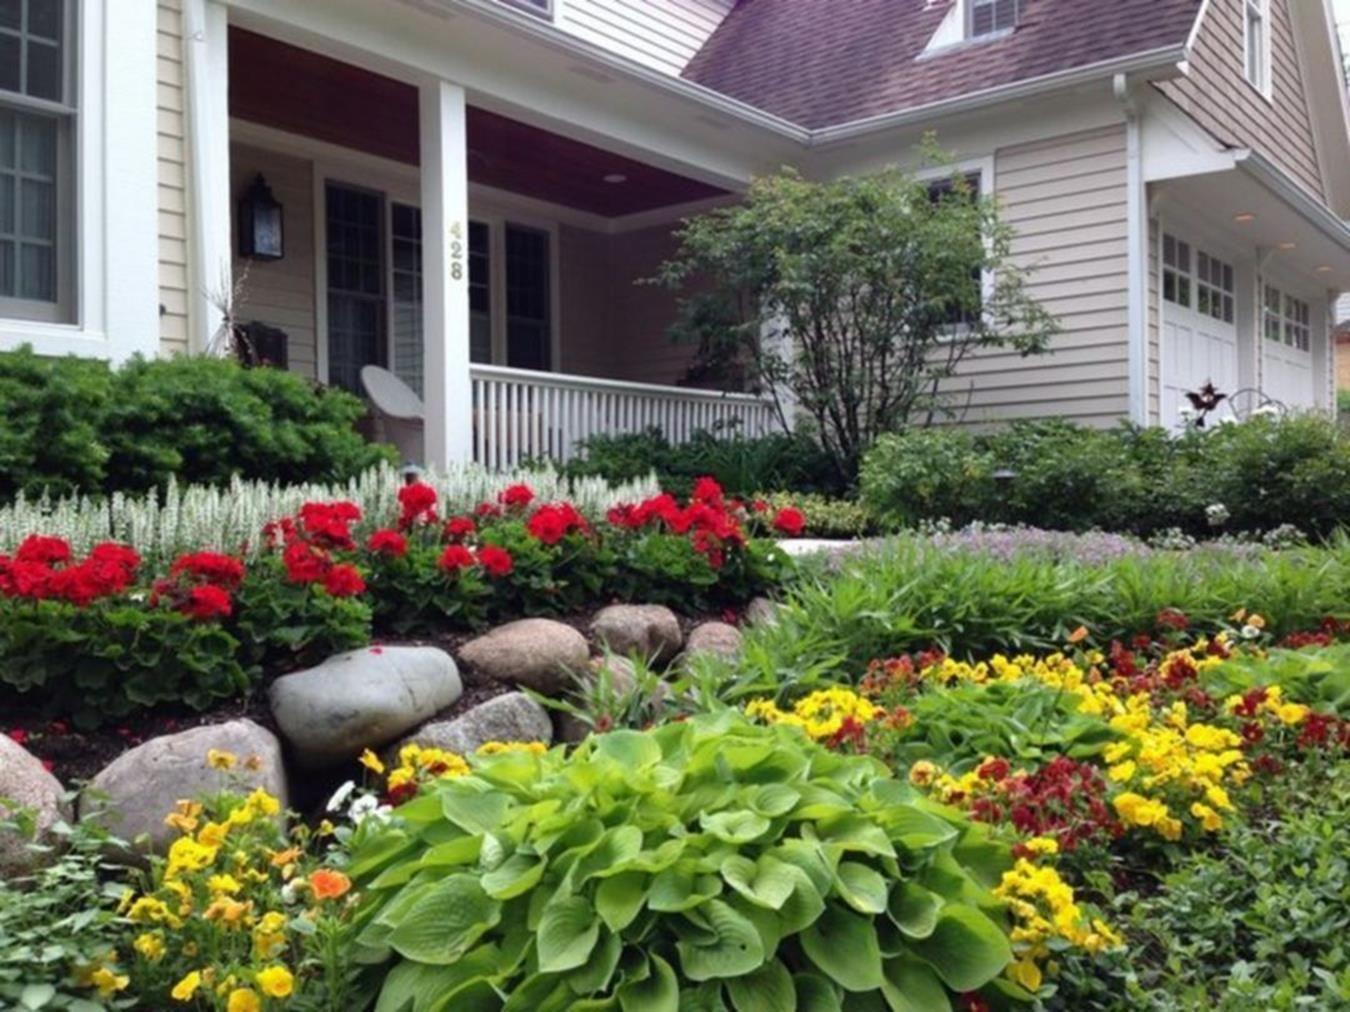 Planting A Perennial Garden That Is Low Maintenance Decor Renewal Full Sun Landscaping Full Sun Garden Front Yard Landscaping